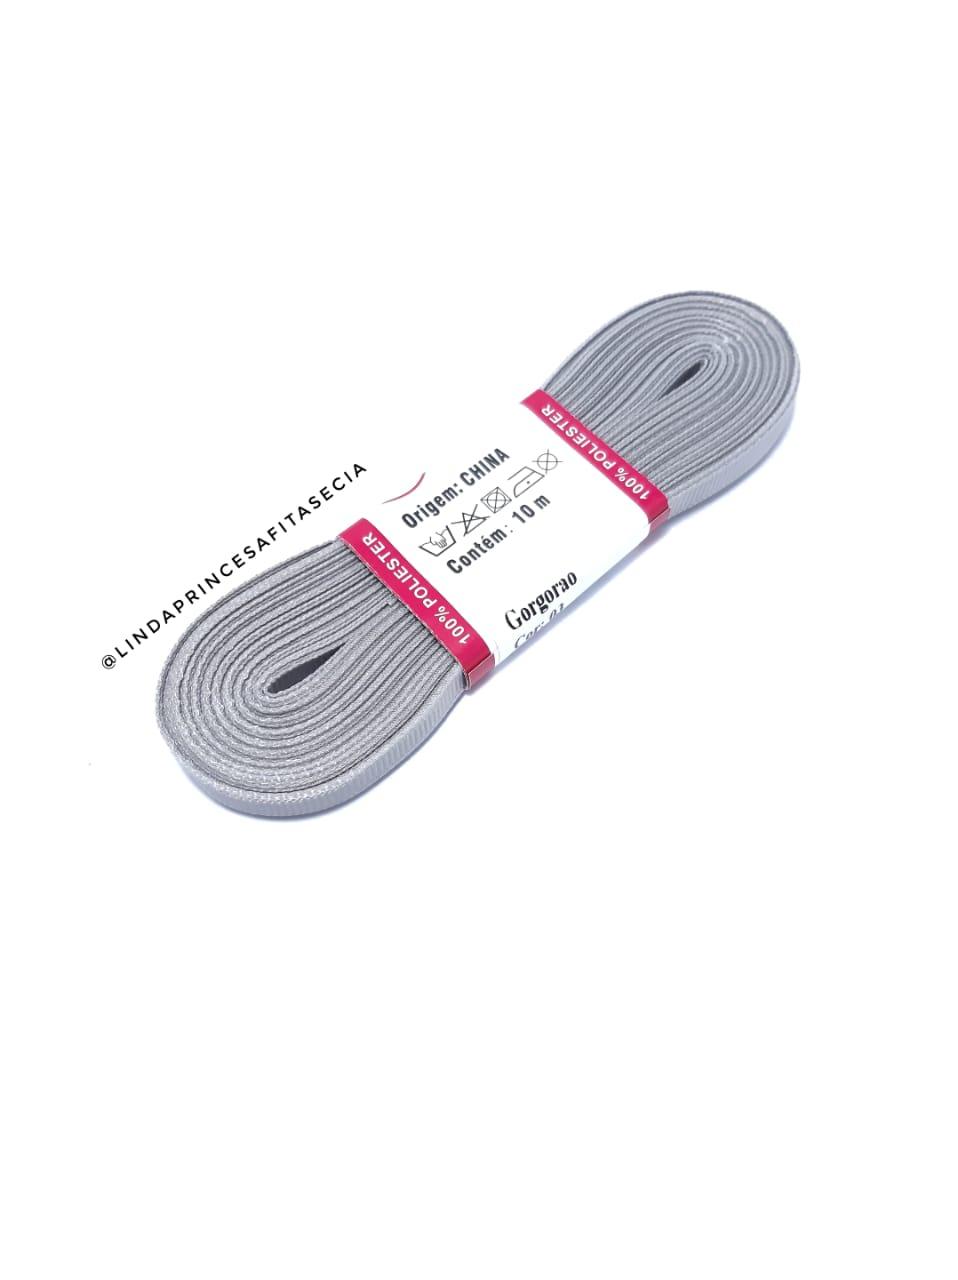 FITA SANDING 7 mm - Cor: 003 Cinza